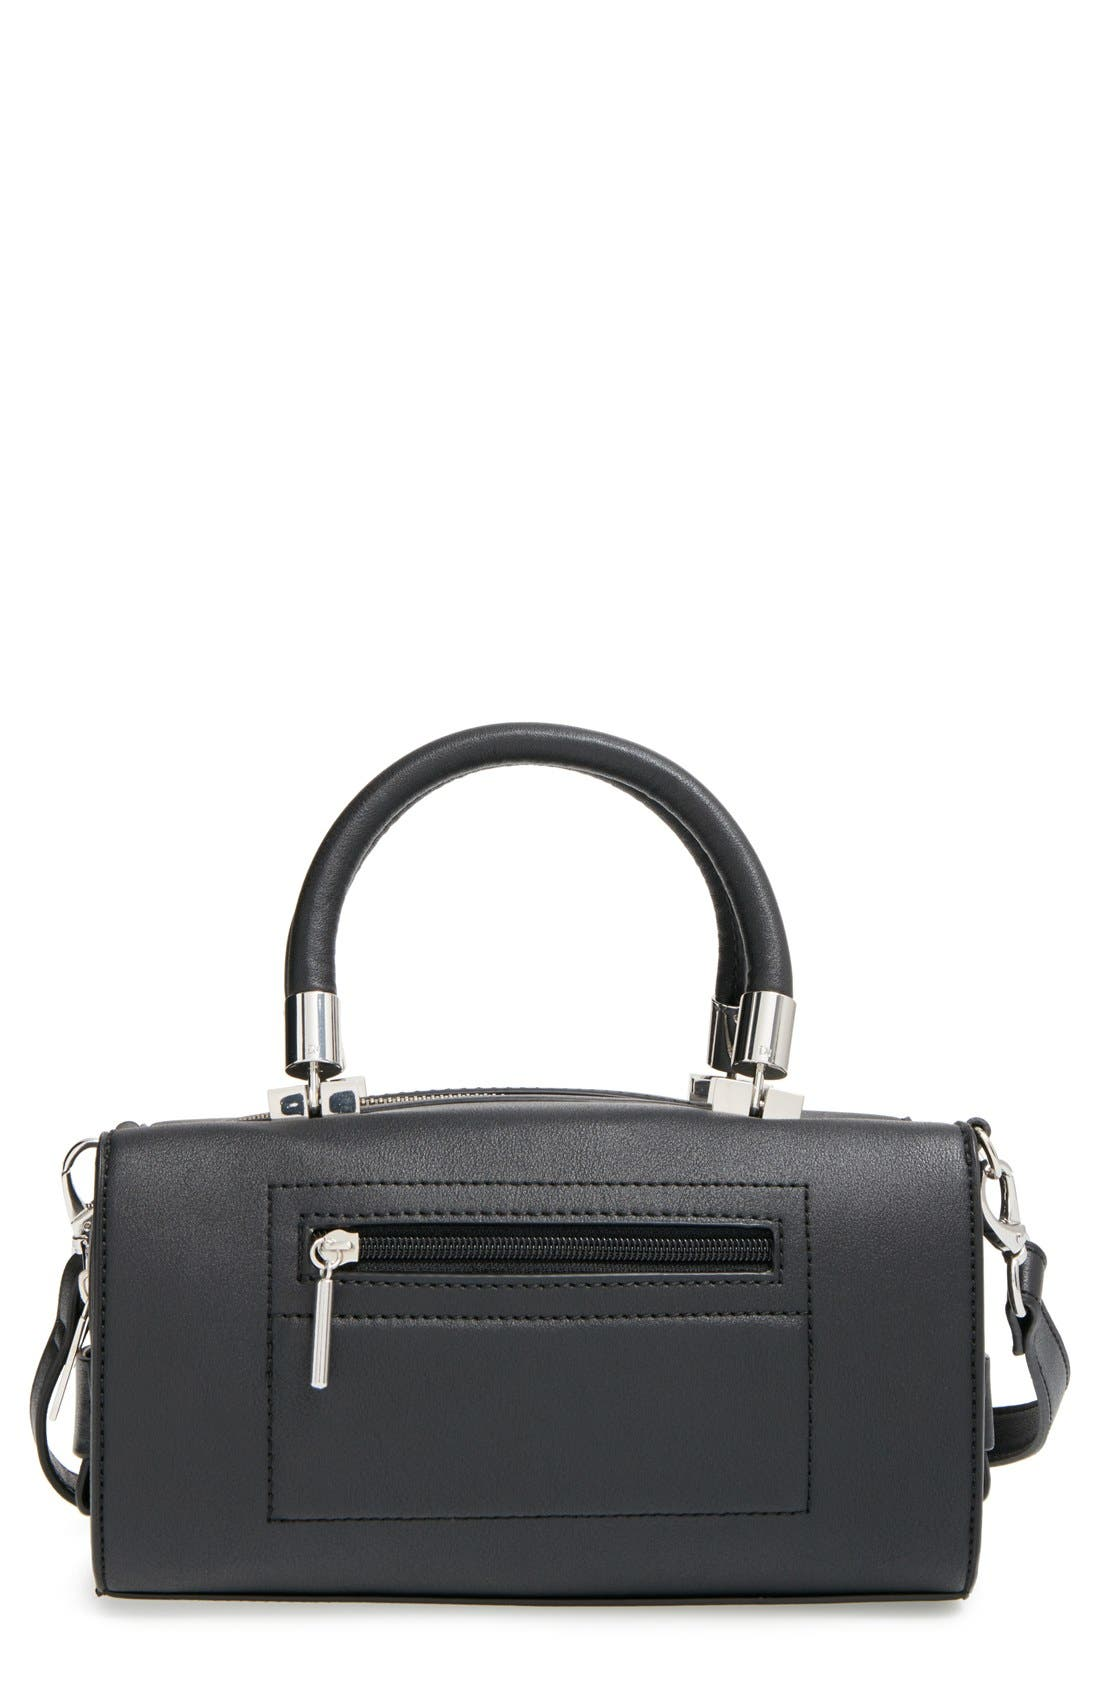 Main Image - Danielle Nicole 'Whitney' Faux Leather Crossbody Bag